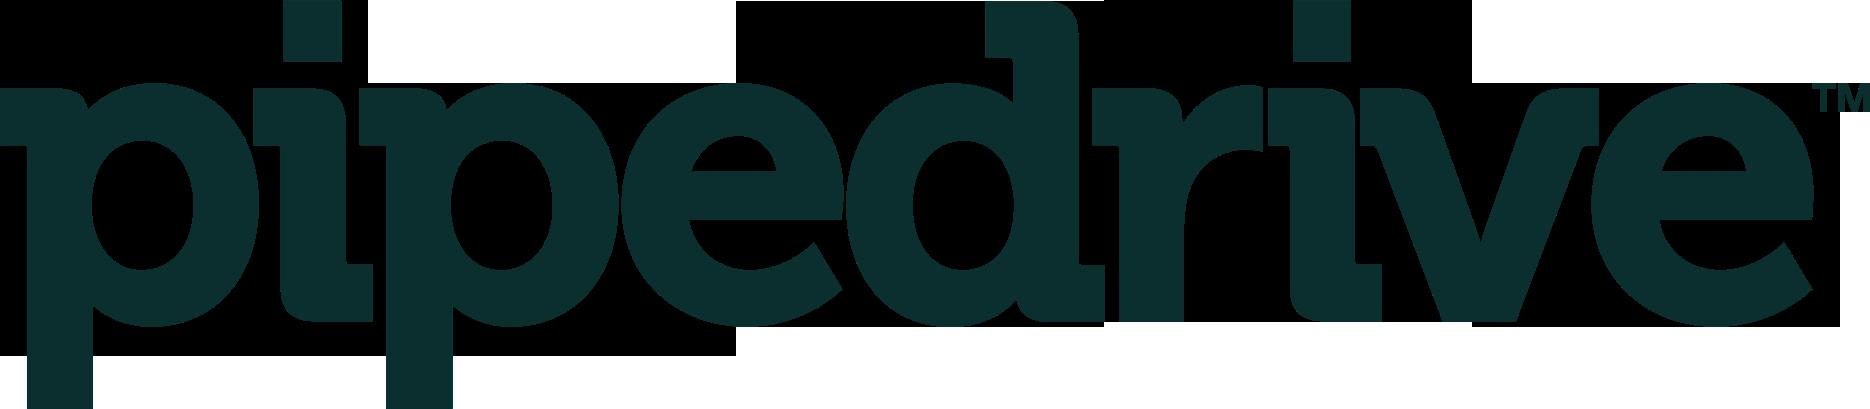 Pipedrive_Logo